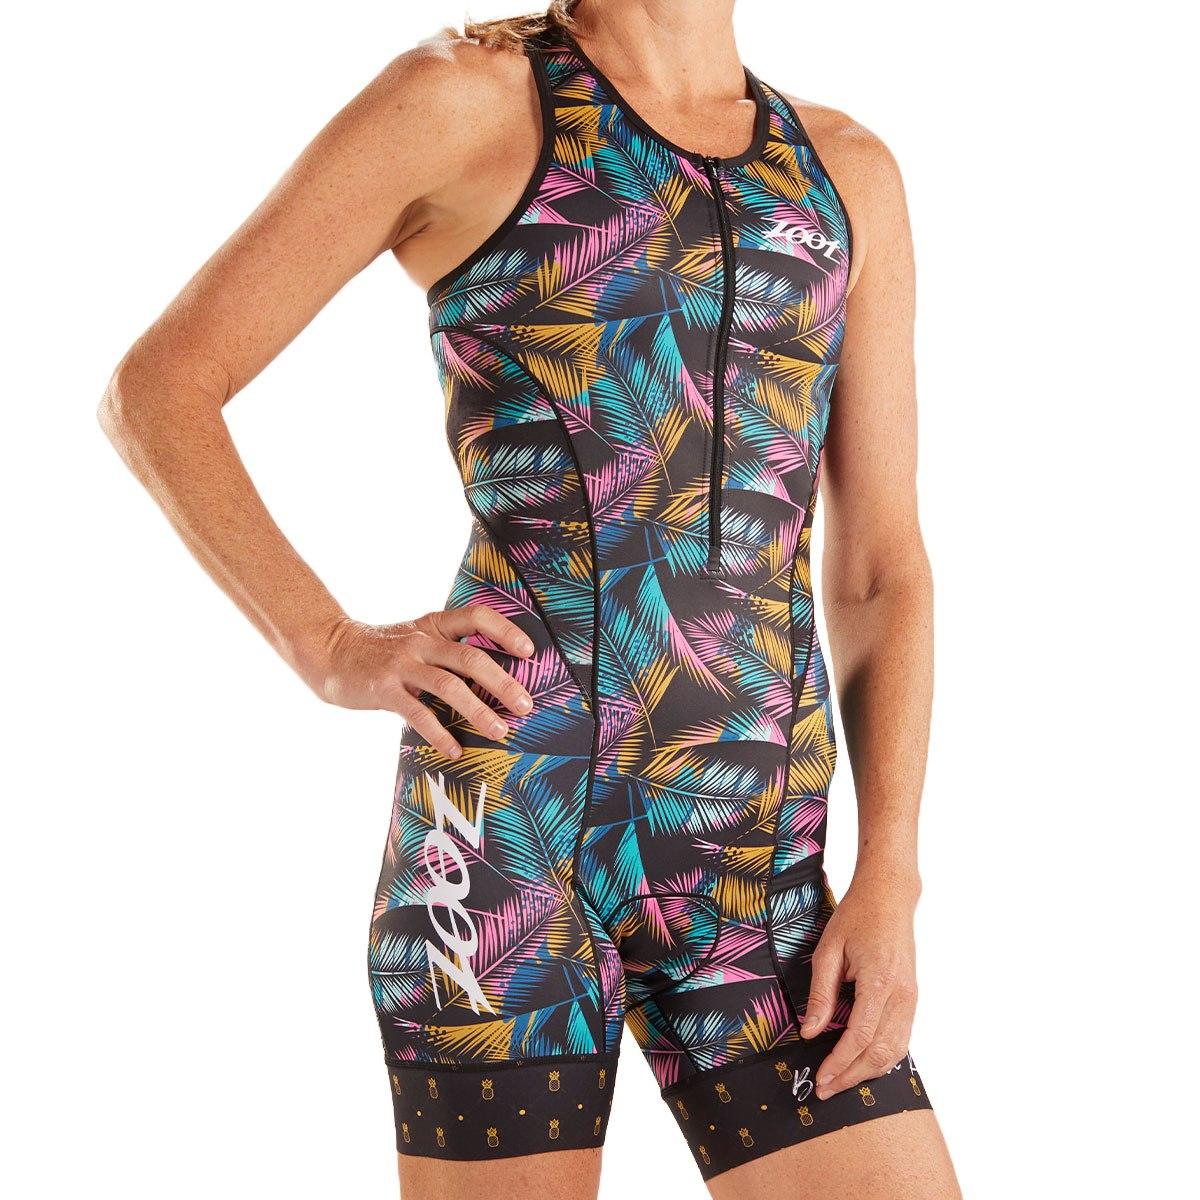 Image of ZOOT W LTD Tri Women's Racesuit - ali'i 19